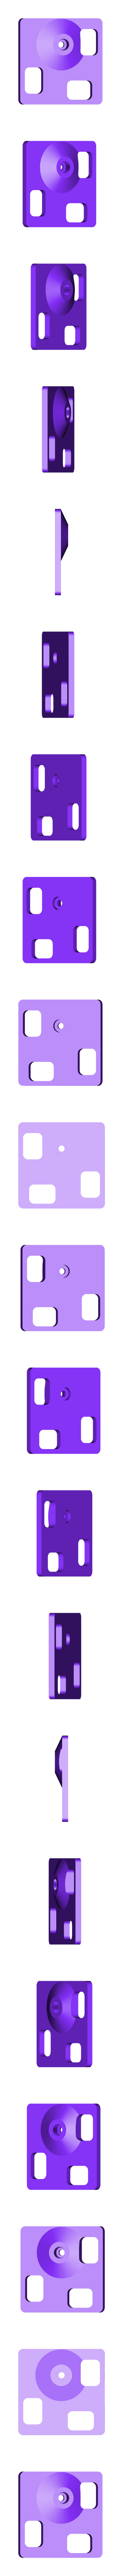 roll04.STL Download free STL file Pan, tilt and roll camera pod for FPV. • 3D printing object, tahustvedt